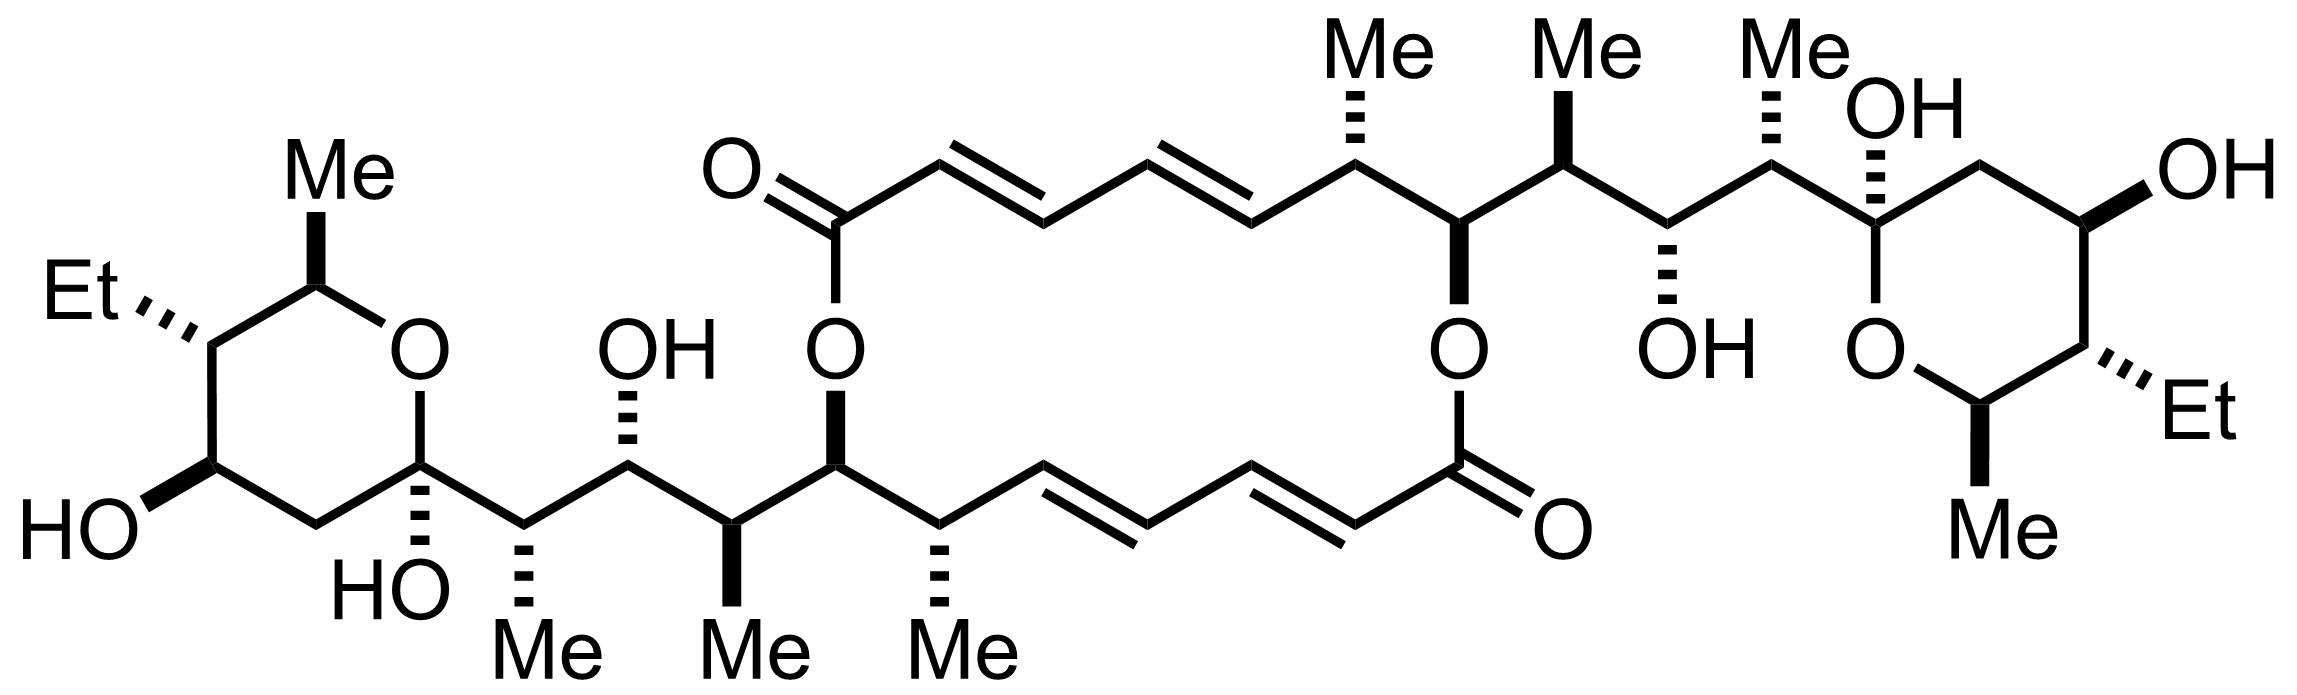 Elailoide structure